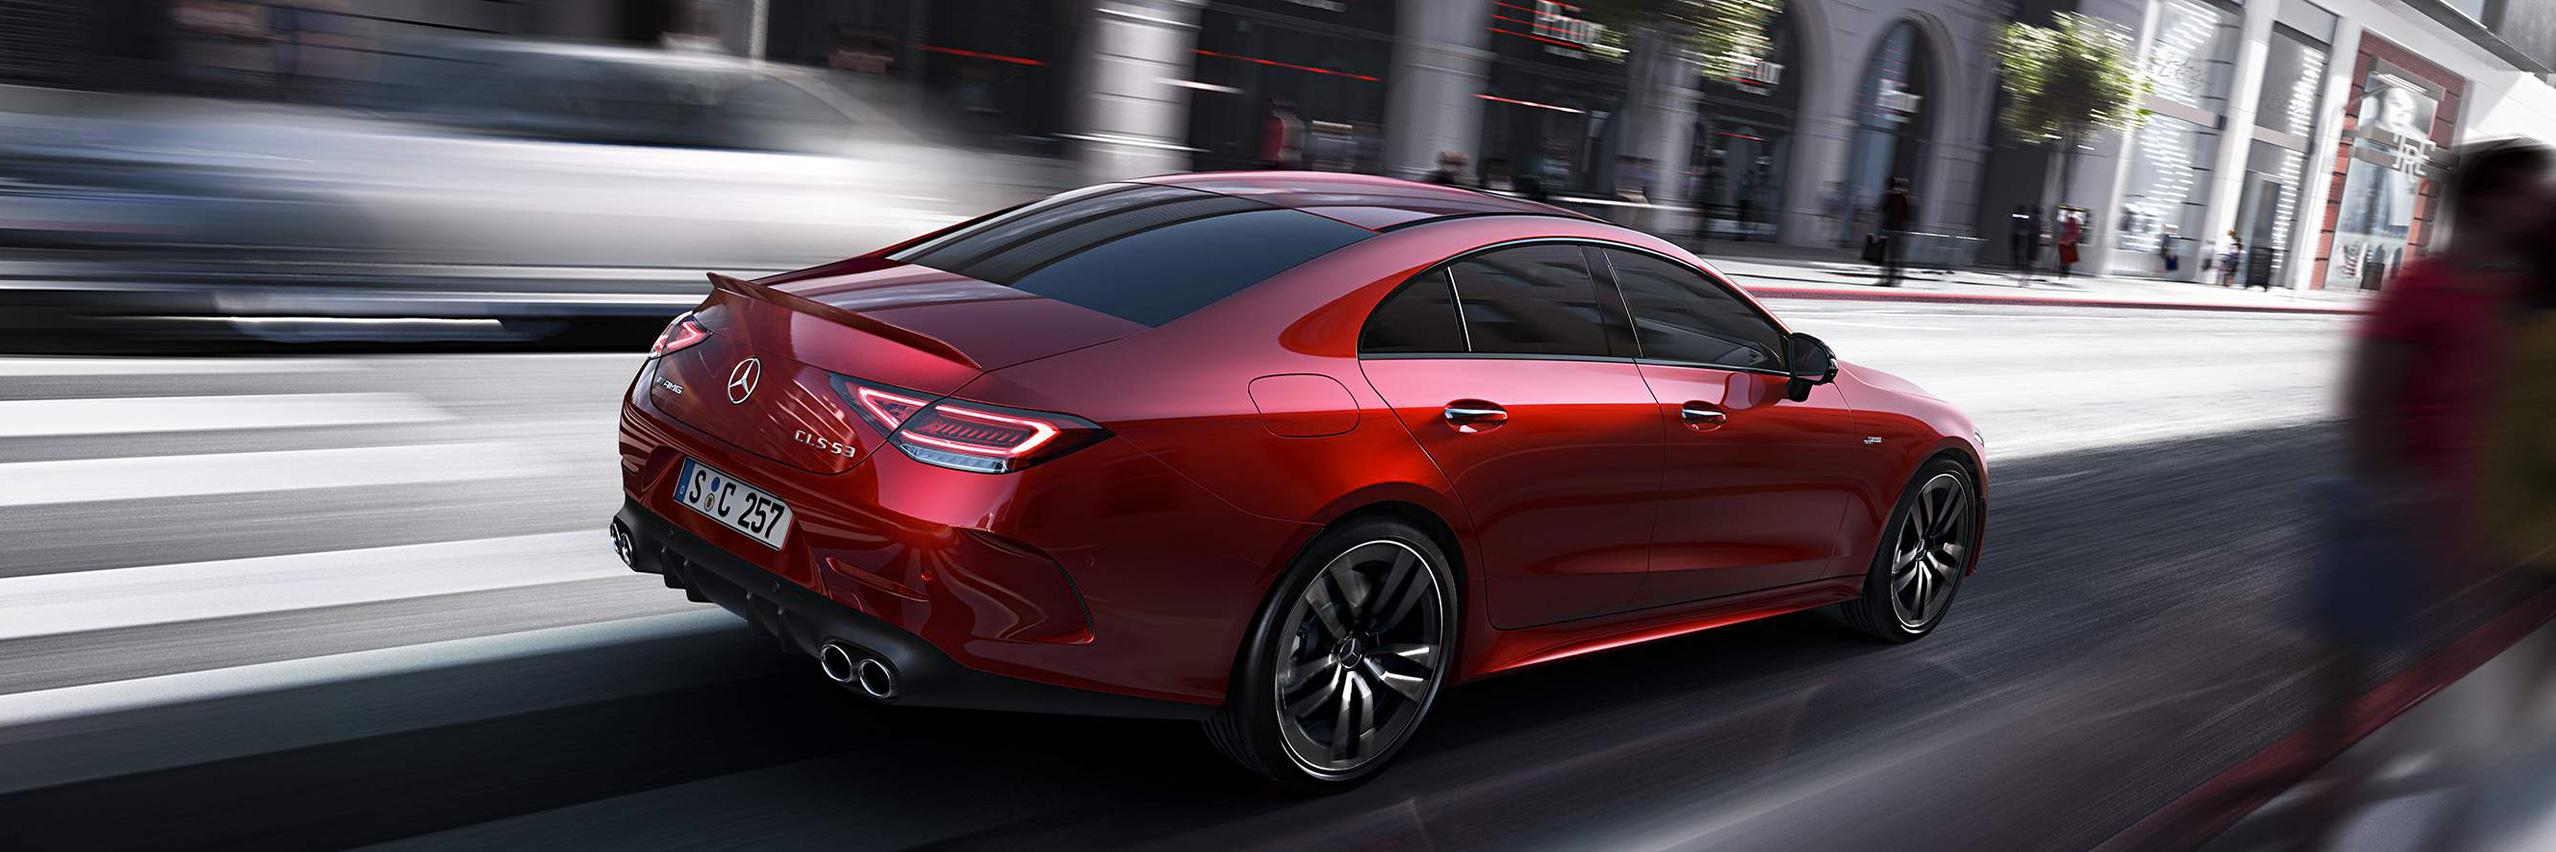 CAR-Avenue-Mercedes-AMG-CLS-coupe-04